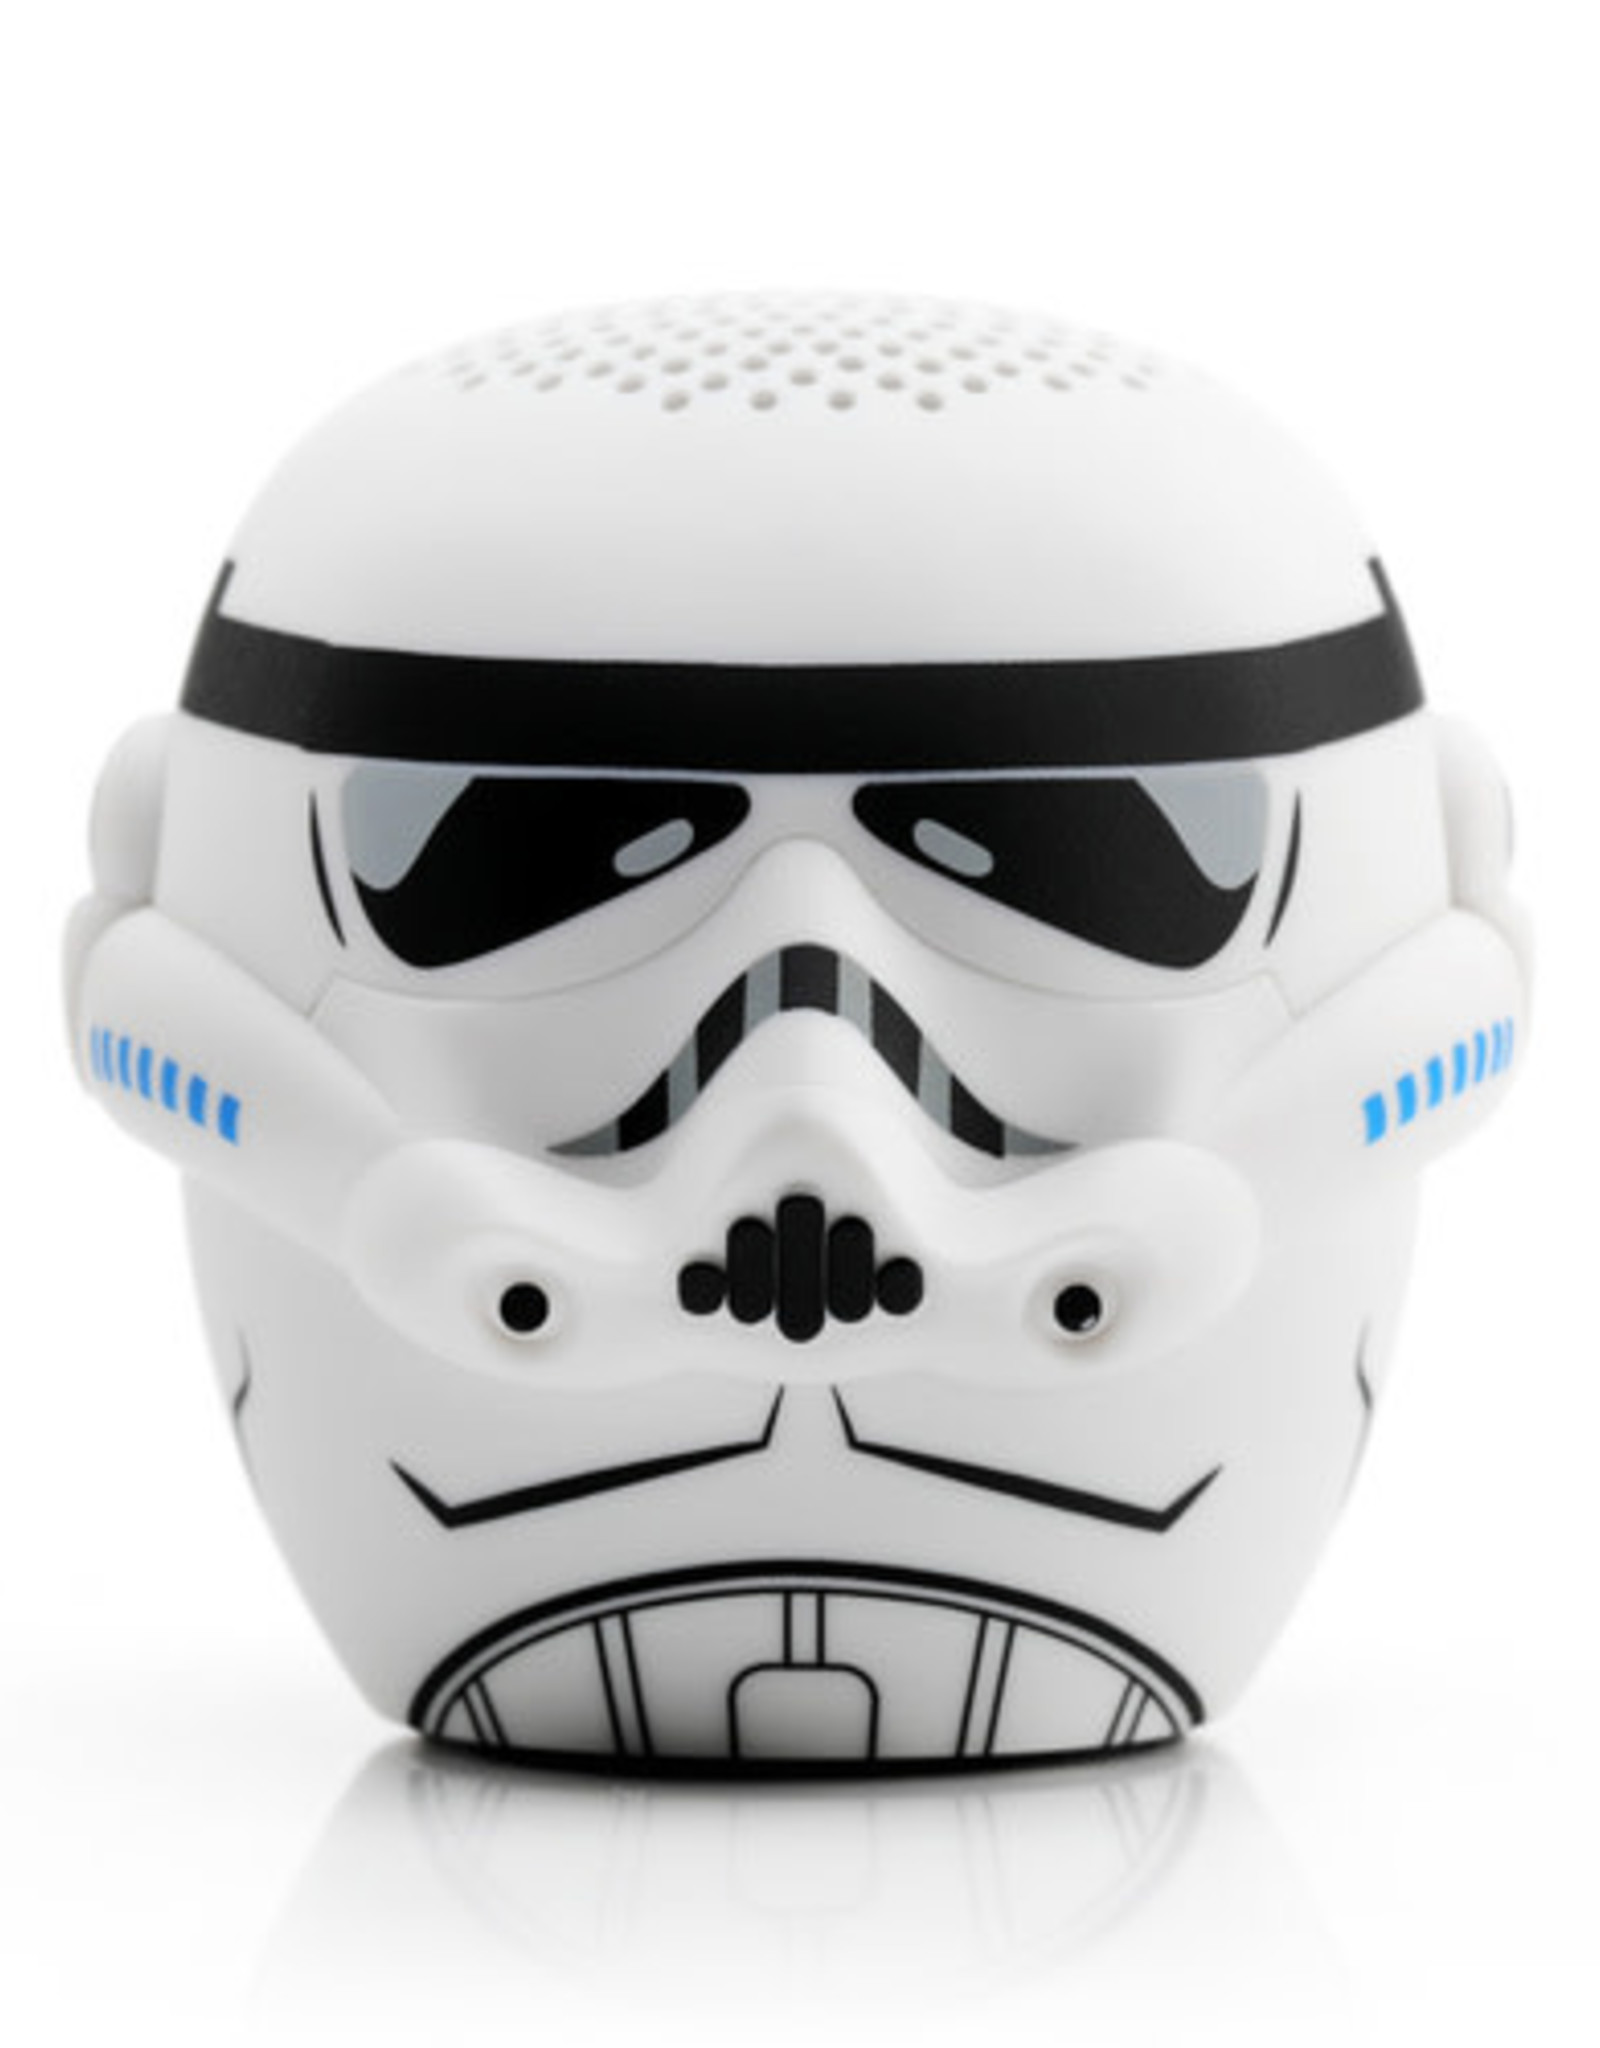 Bitty Boomers Stormtrooper Bluetooth Speaker